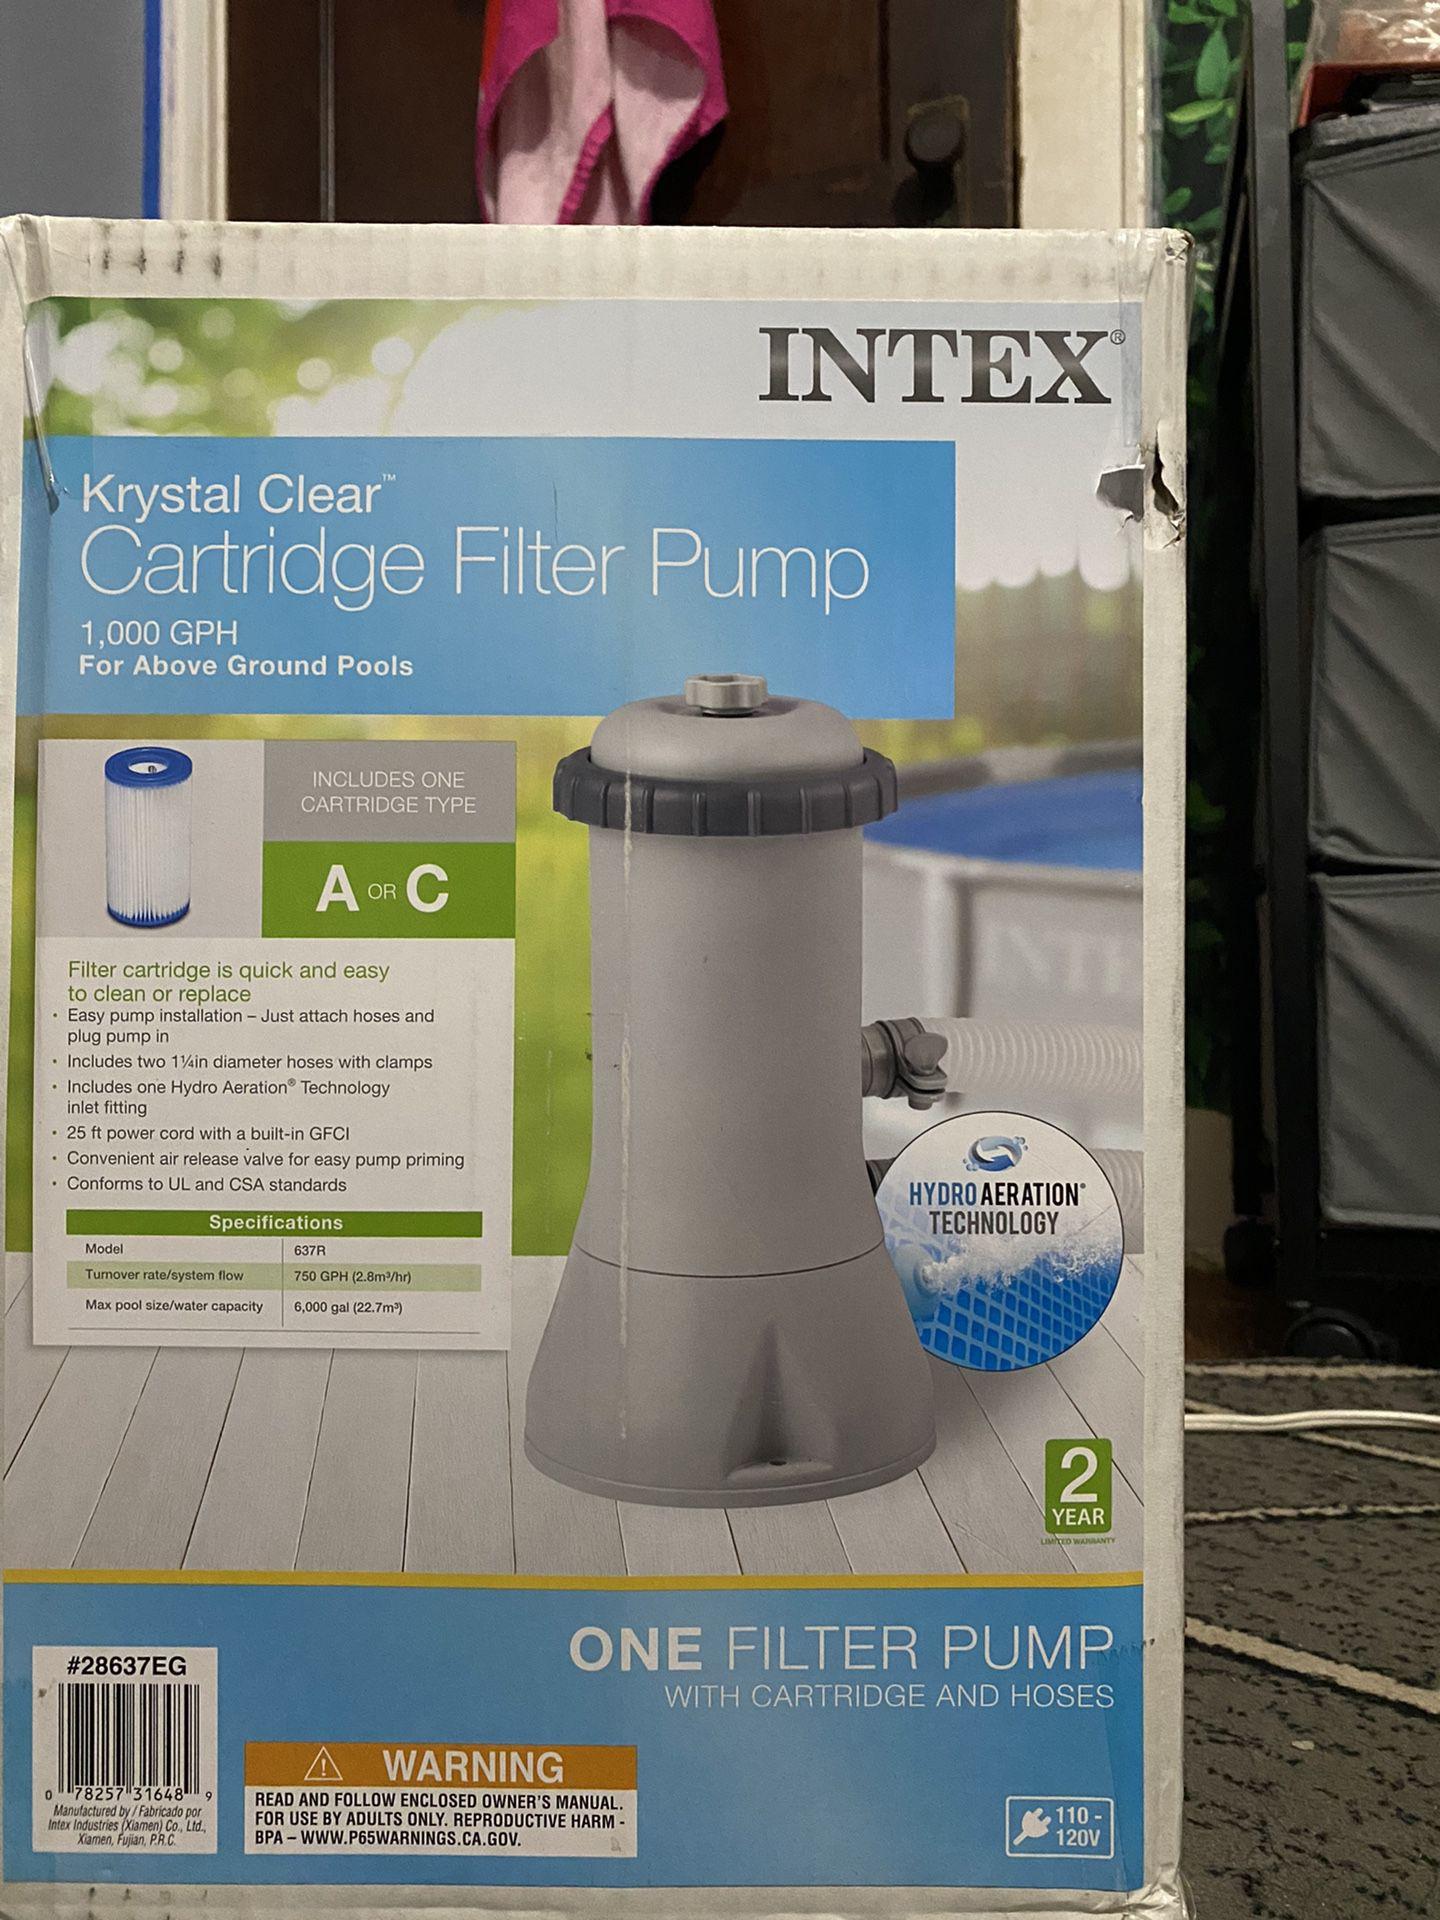 Brand New  , Unopened Krystal Clear Intex Filter 1000gph